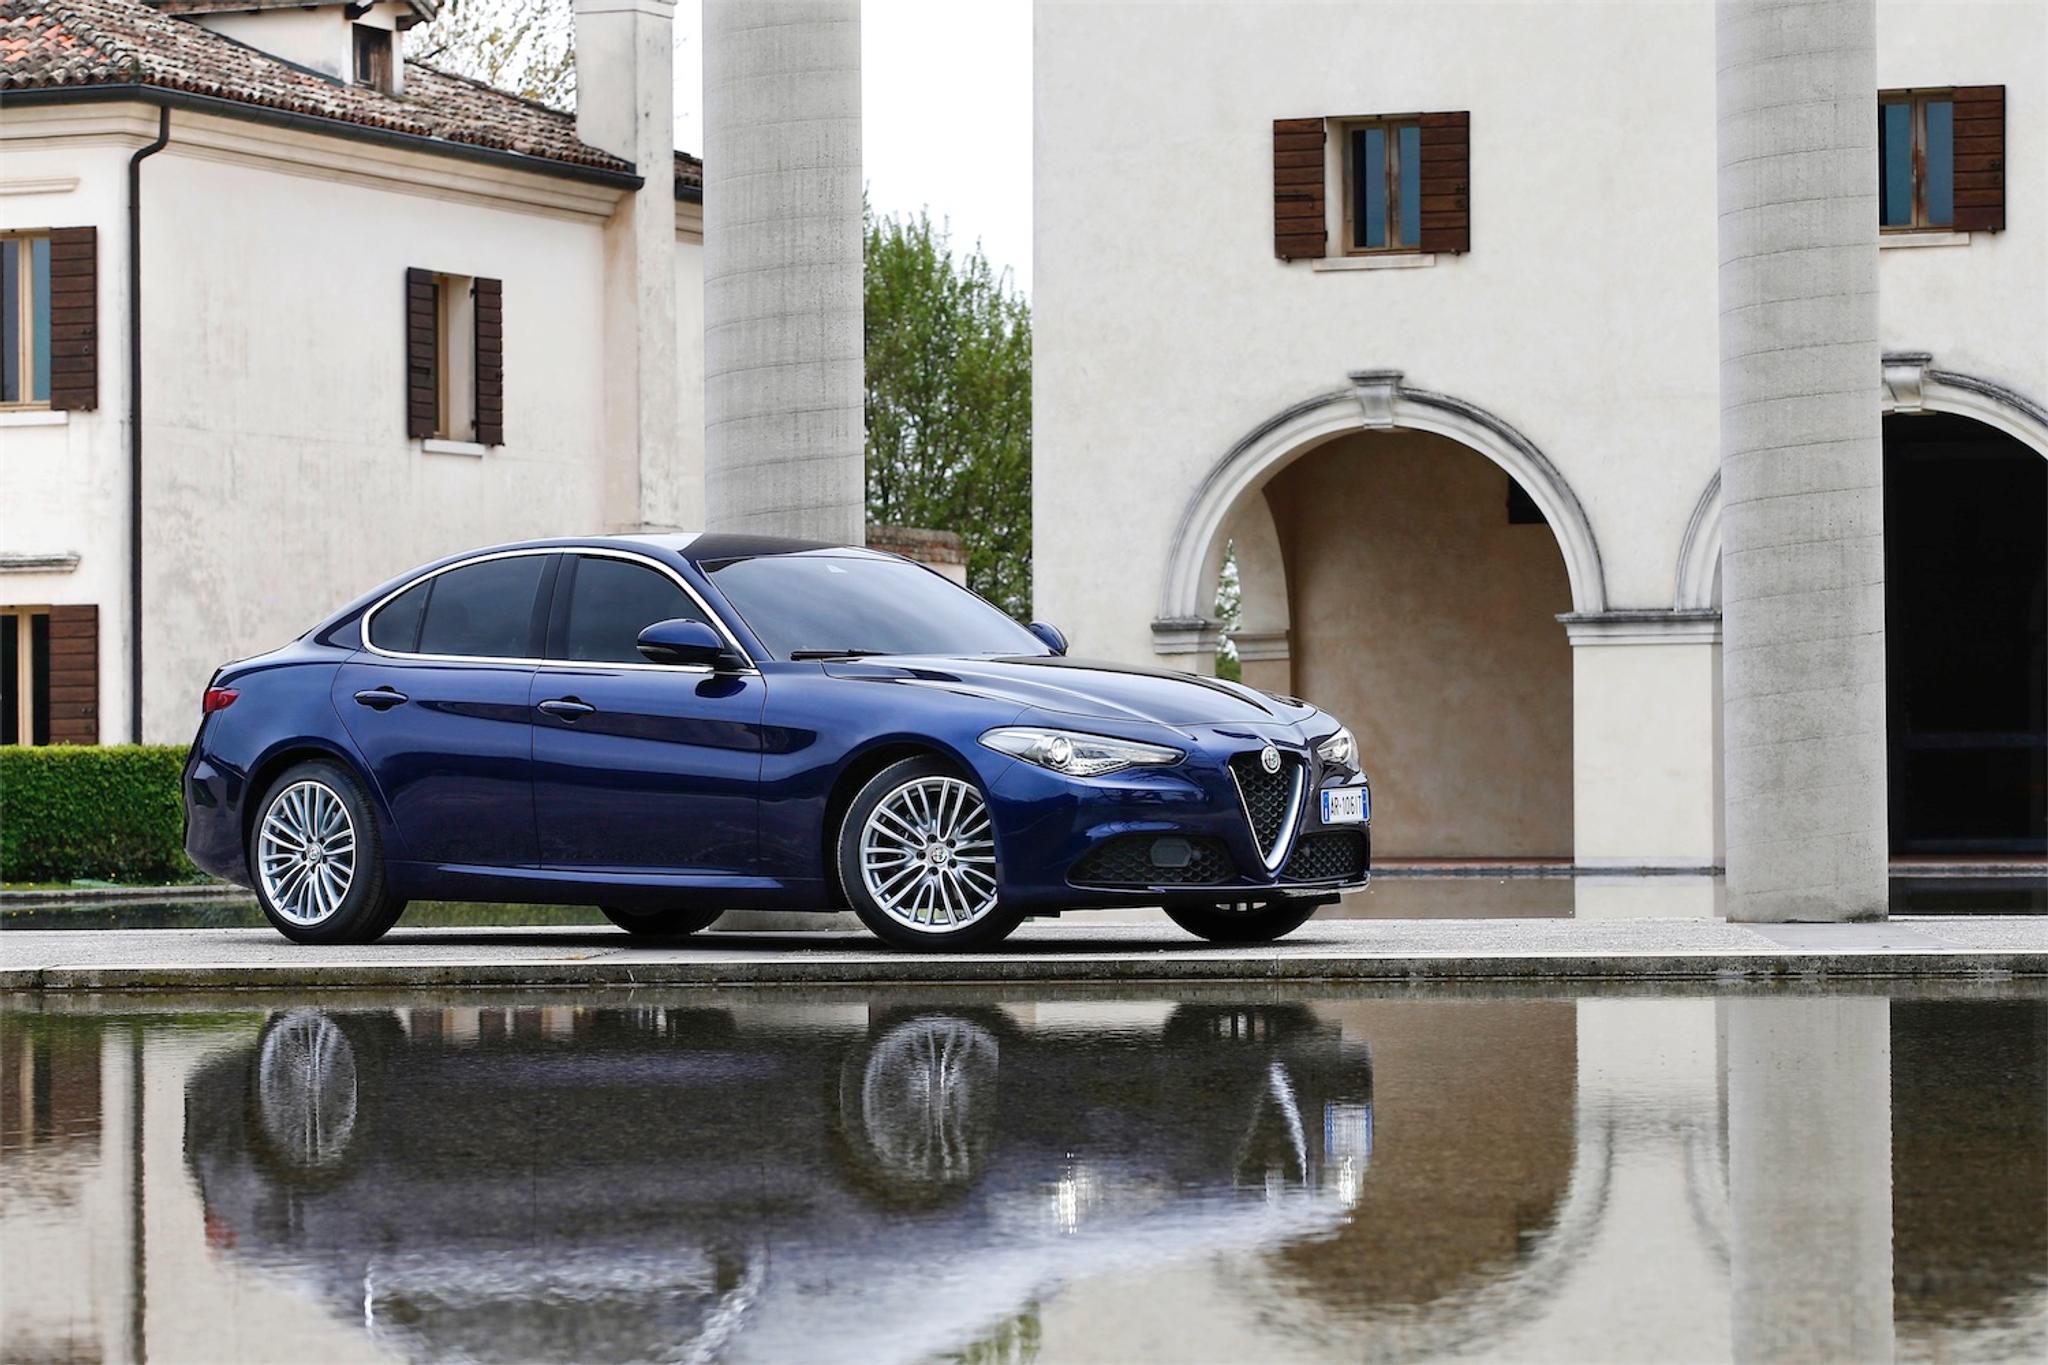 Alfa Giulia Qv >> Odotettu Alfa Romeo Giulia Sai Hinnat Myos Himoittava Qv